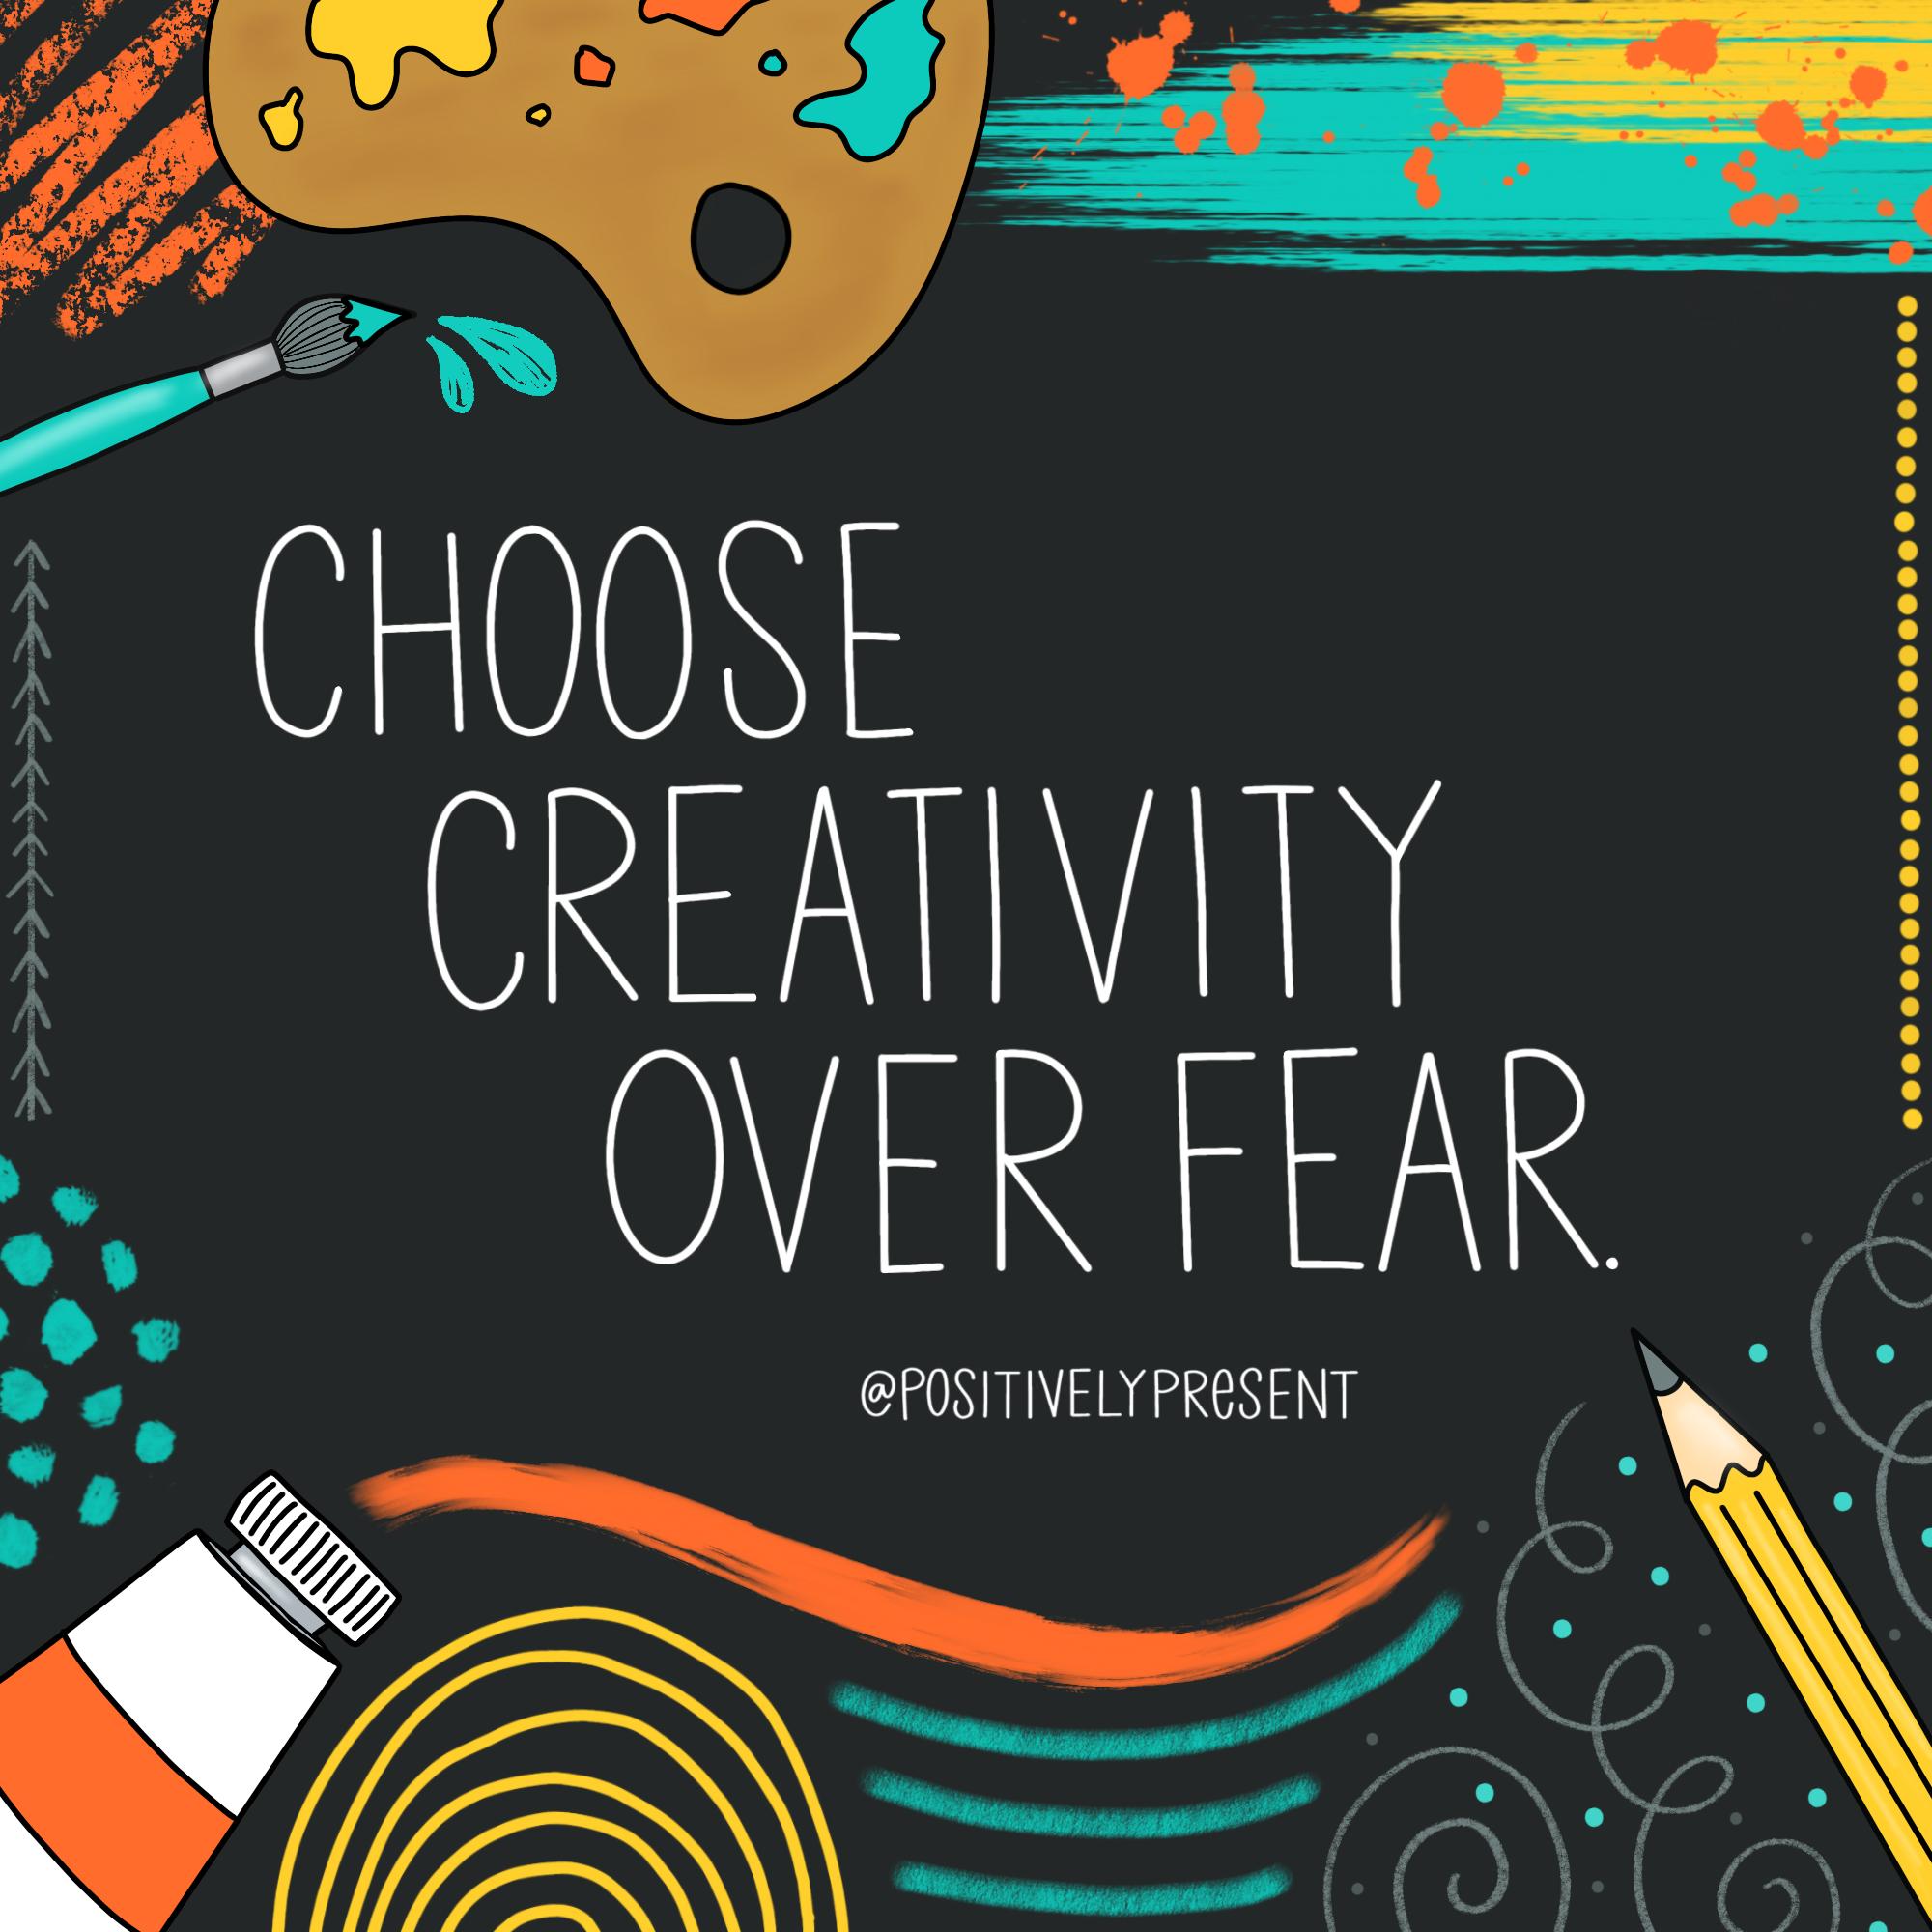 choose creativity